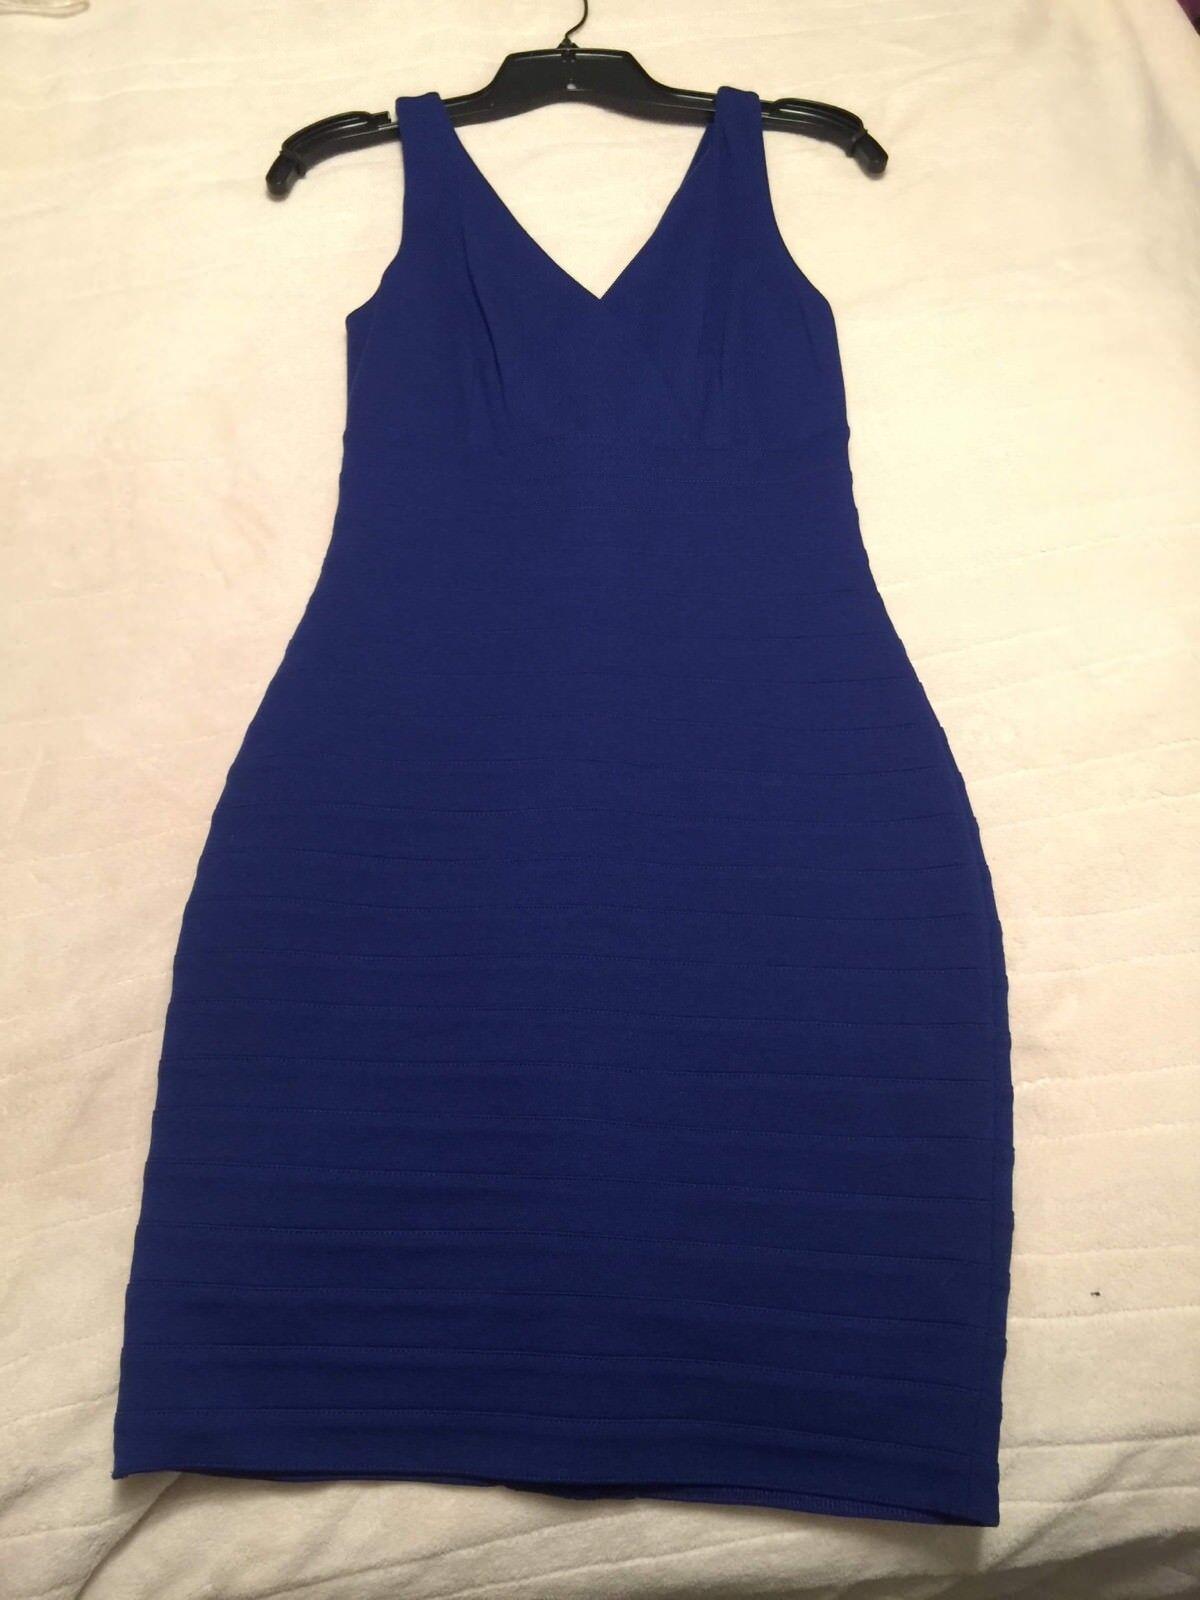 NWT EXPRESS EXPRESS EXPRESS Women's Royal bluee Bodycon Dress, Size XS 36440e